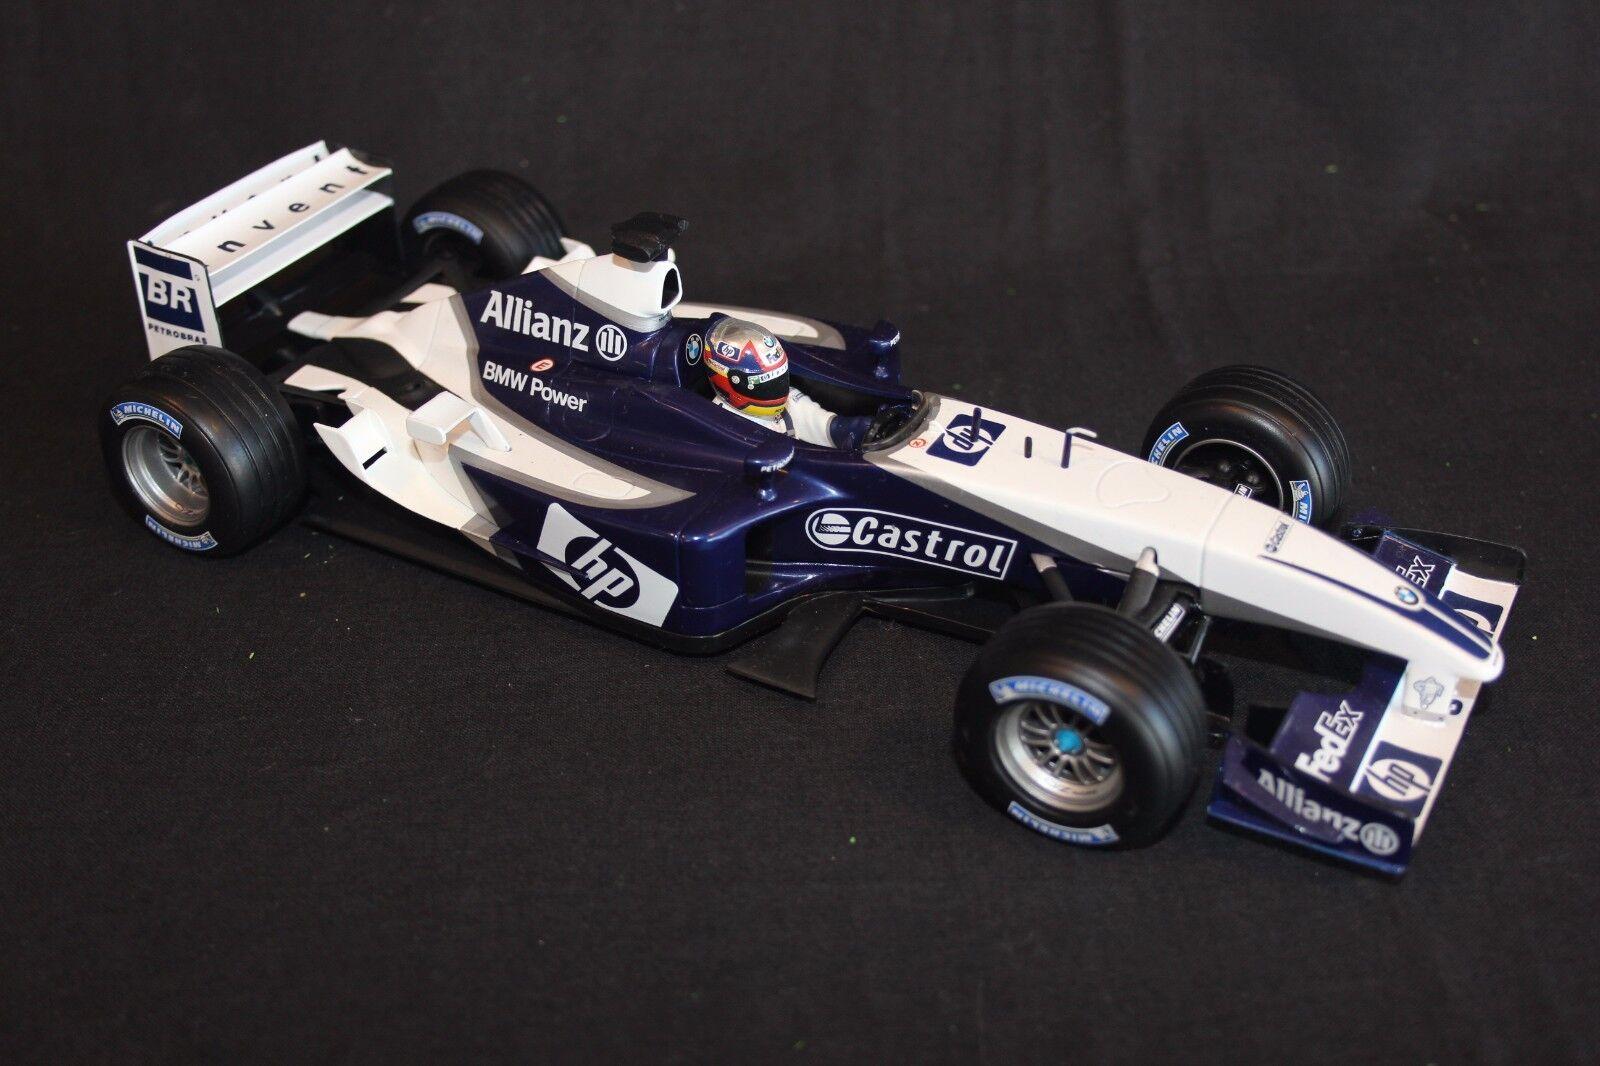 Hot Wheels Williams FW25 2003 1 18  3 Juan Pablo Montoya (COL)